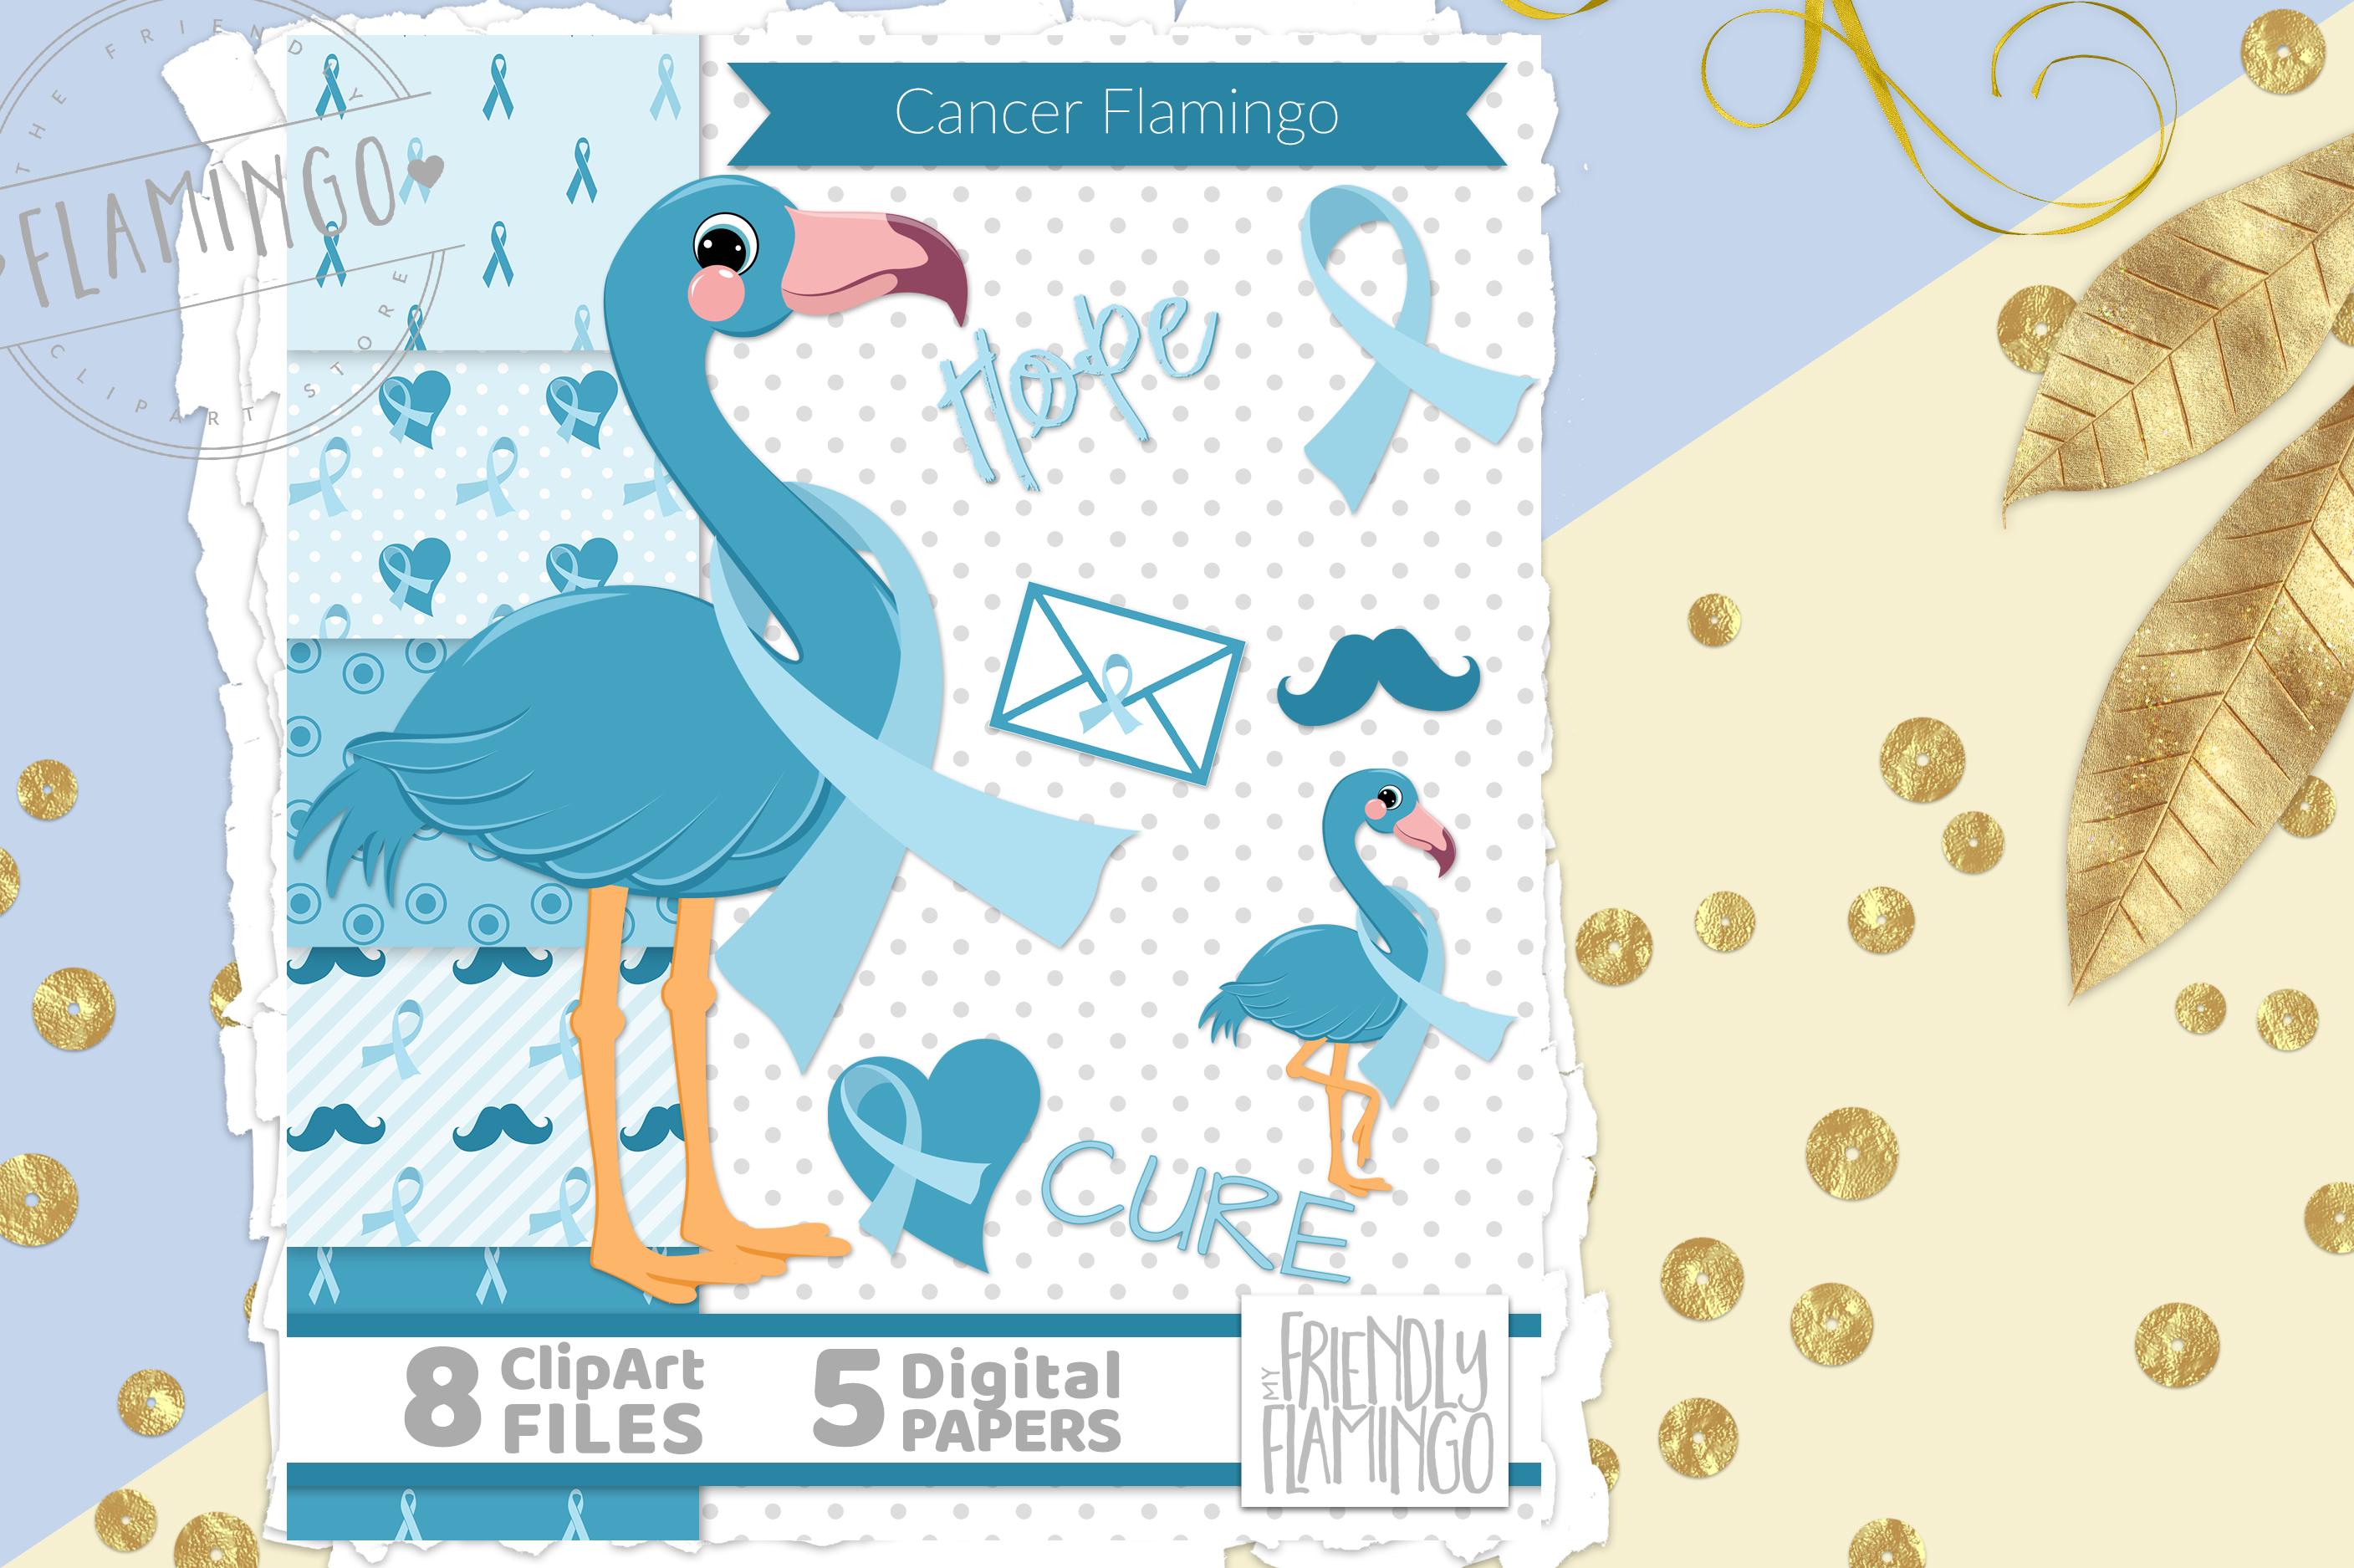 Prostate Cancer Flamingo By MyFriendlyFlamingo  TheHungryJPEG.com #Cancer, #ad, ...